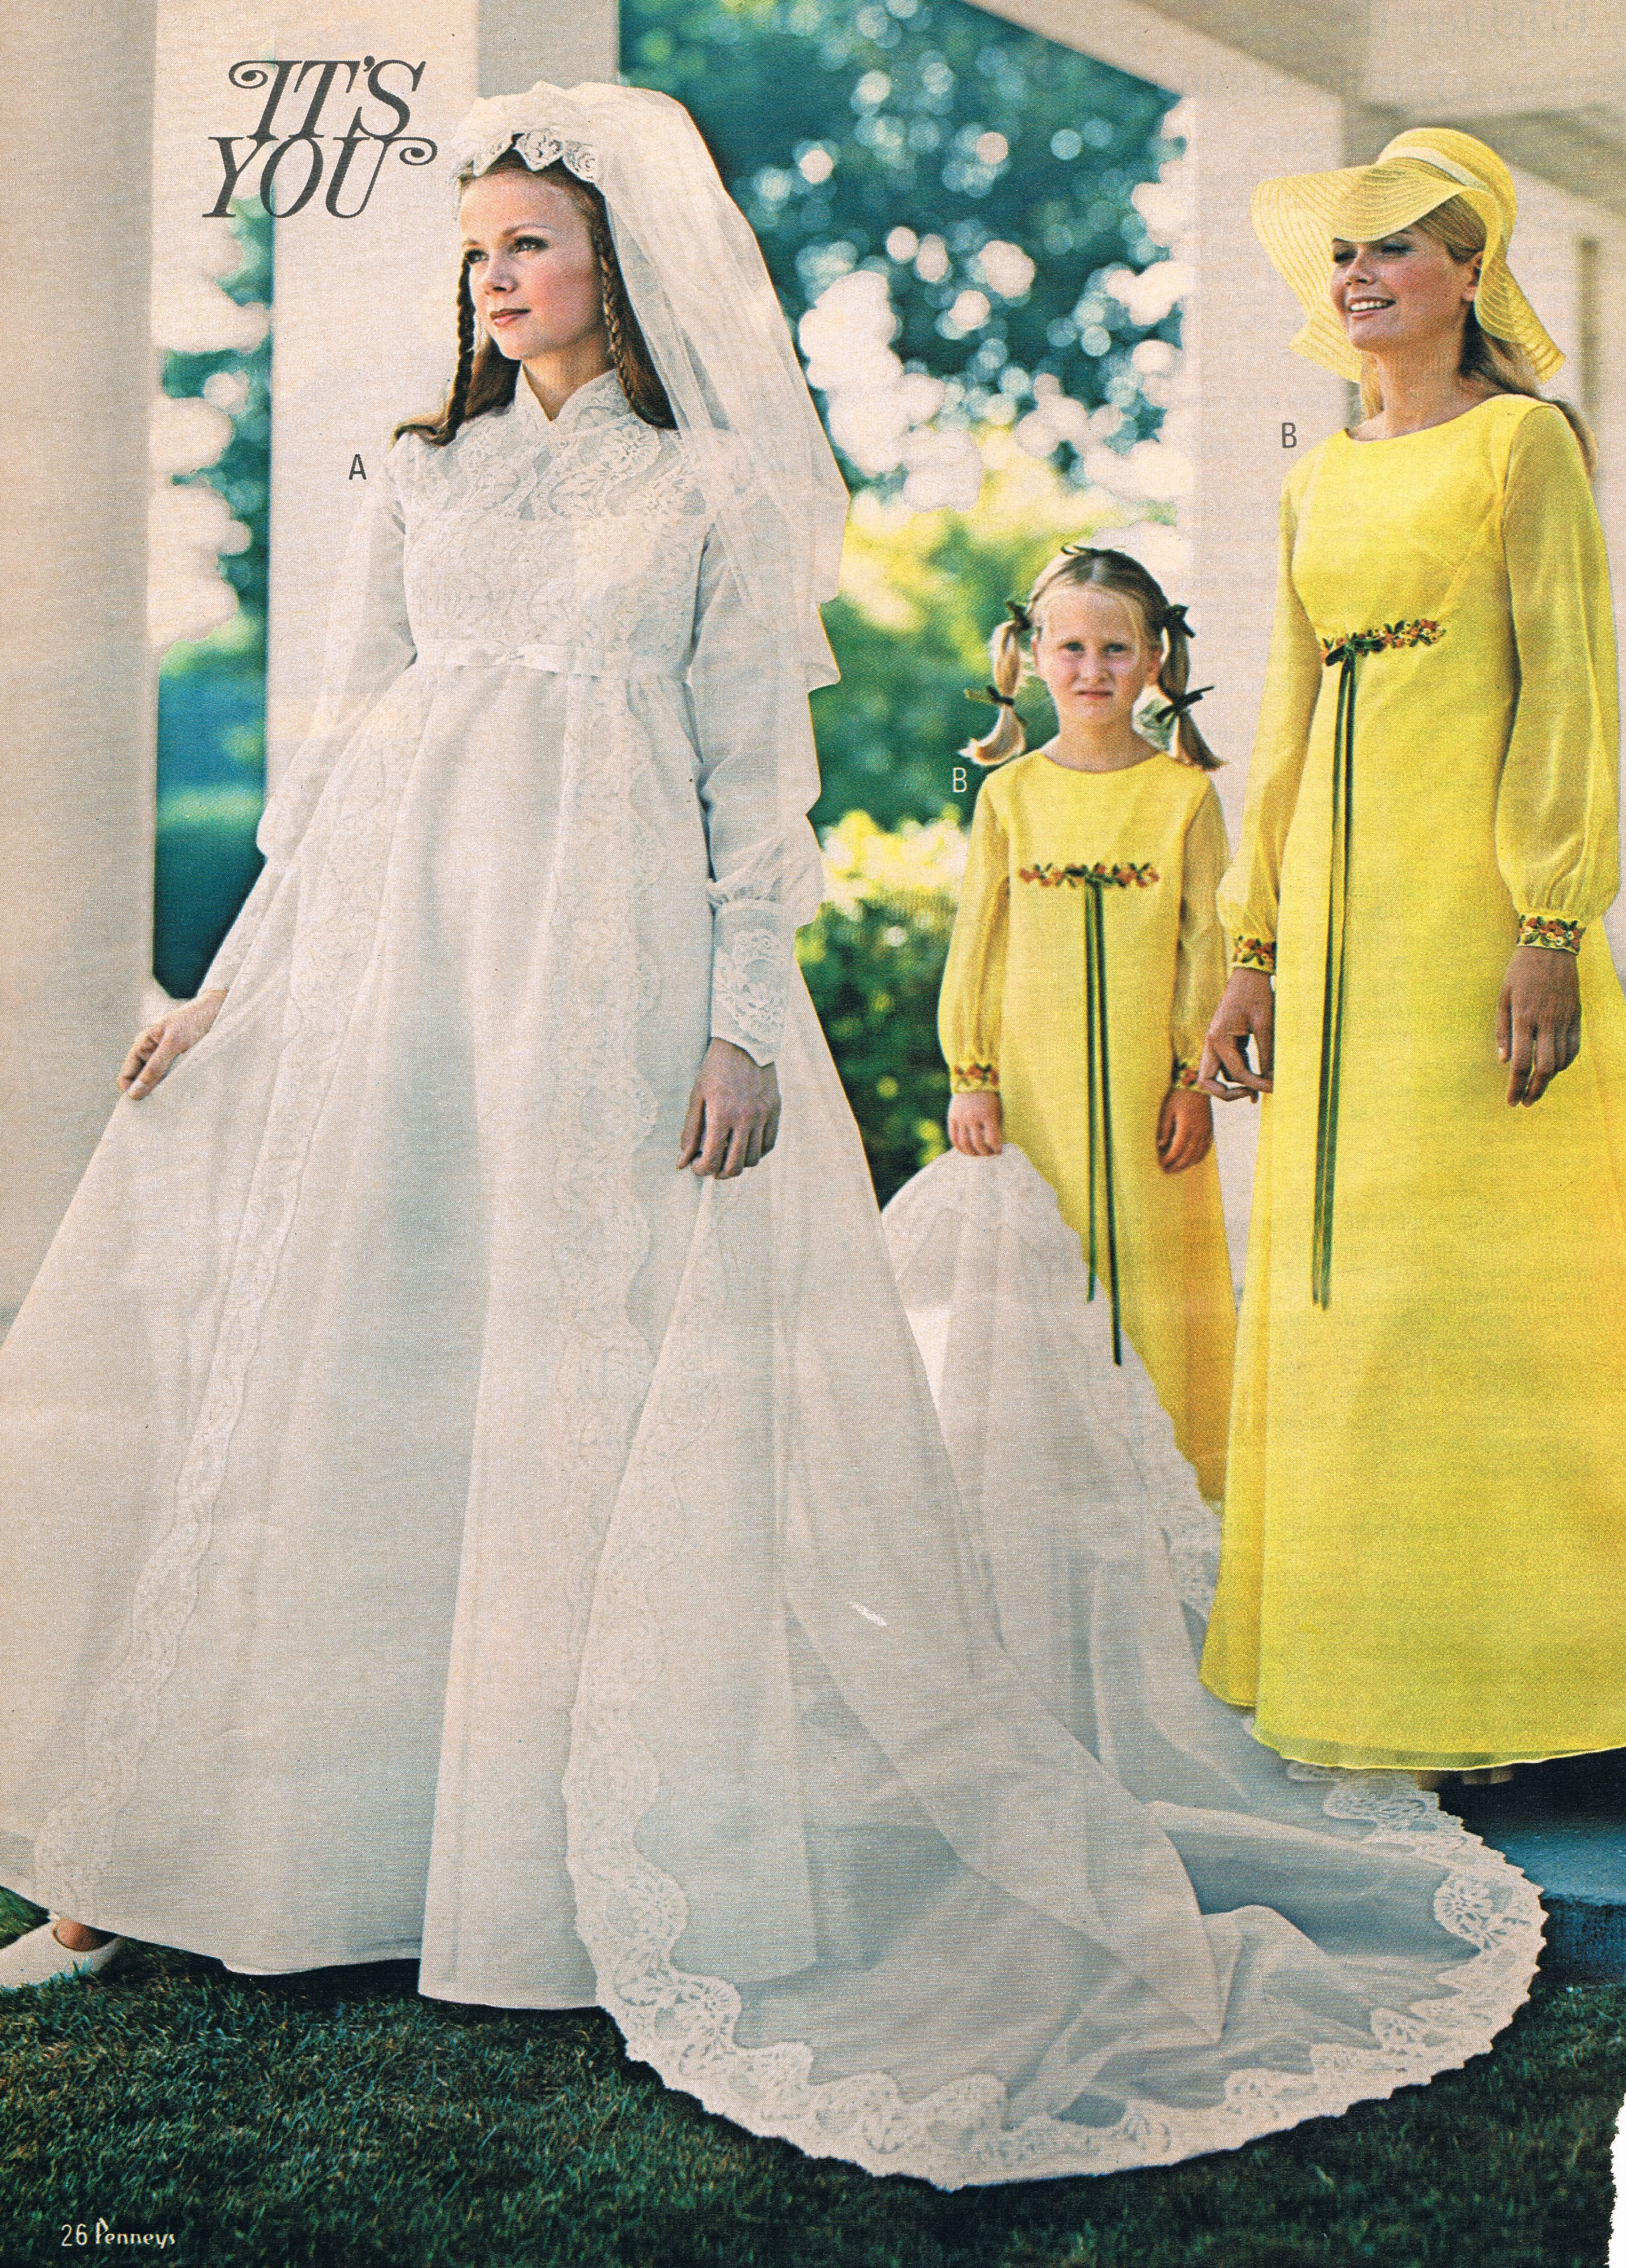 Penneys catalog 70s | 70\'s weddings | Pinterest | Catalog, Vintage ...